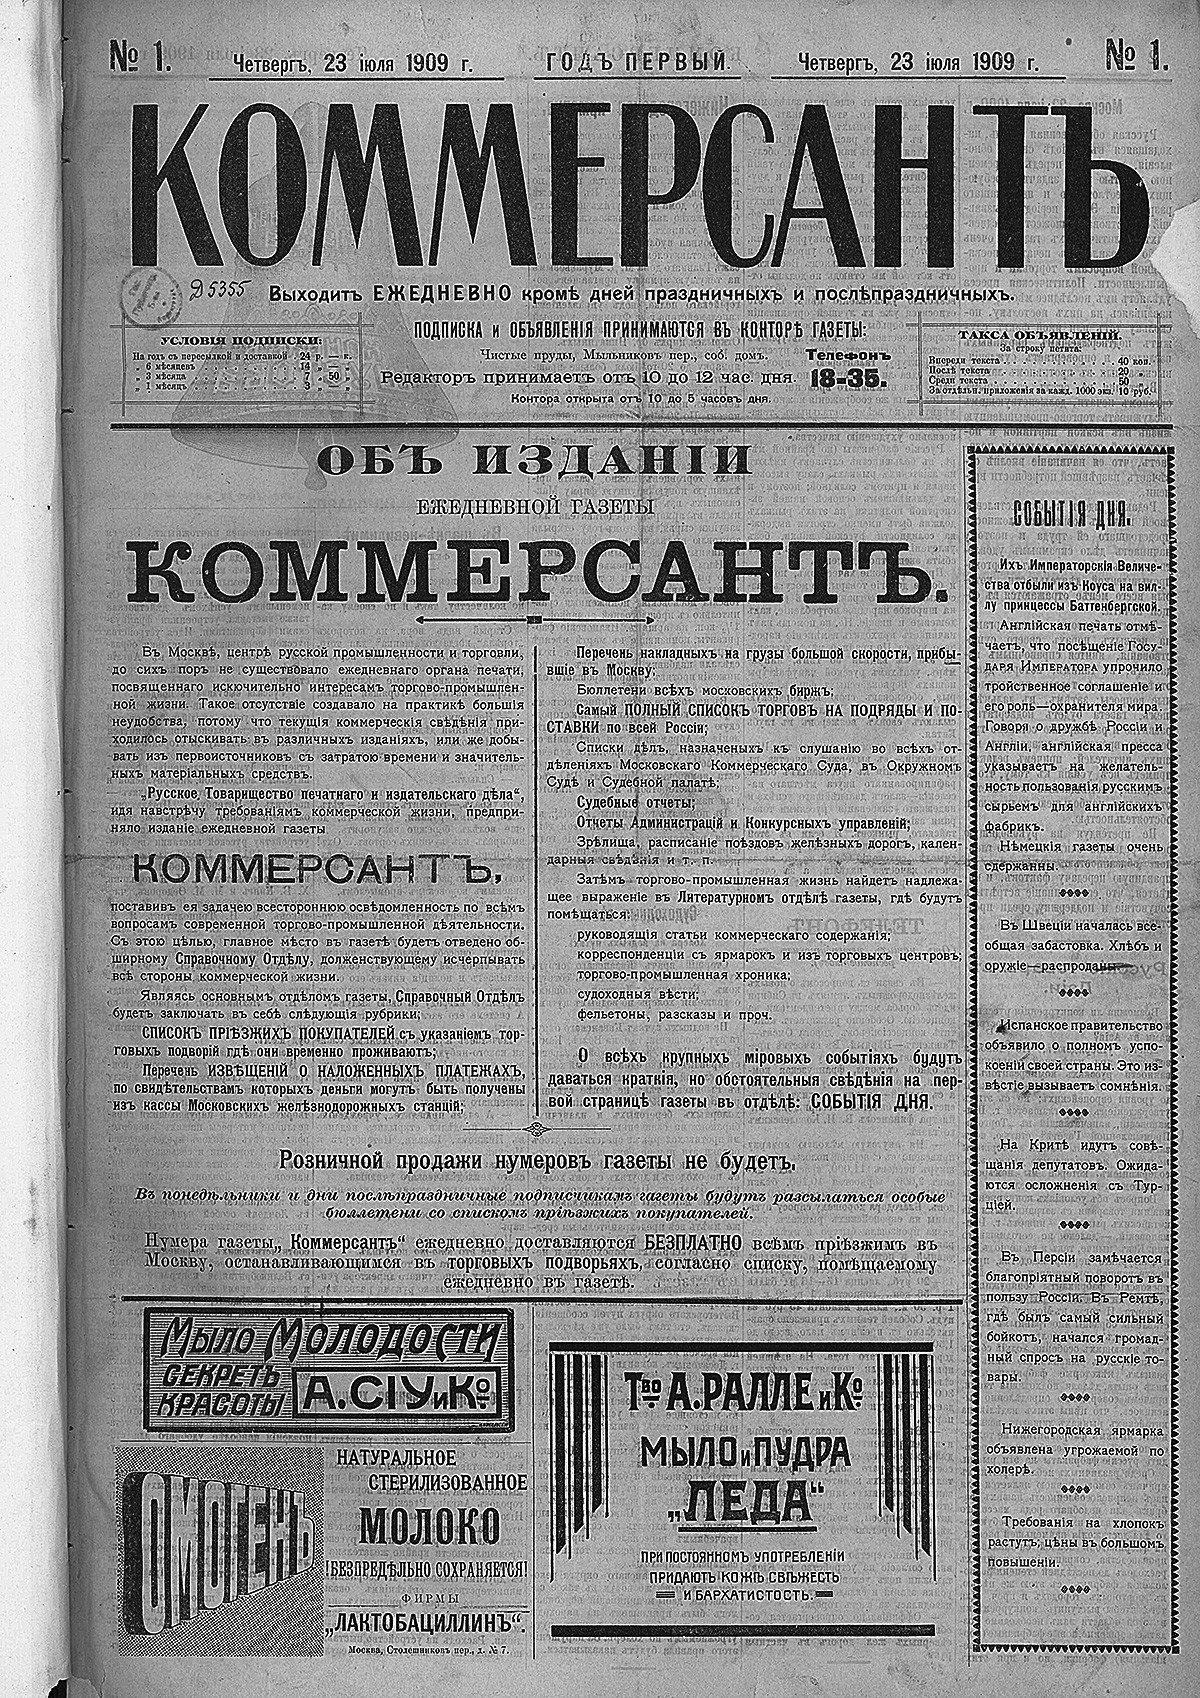 Surat kabar Kommersant pra-Revolusi, 1909